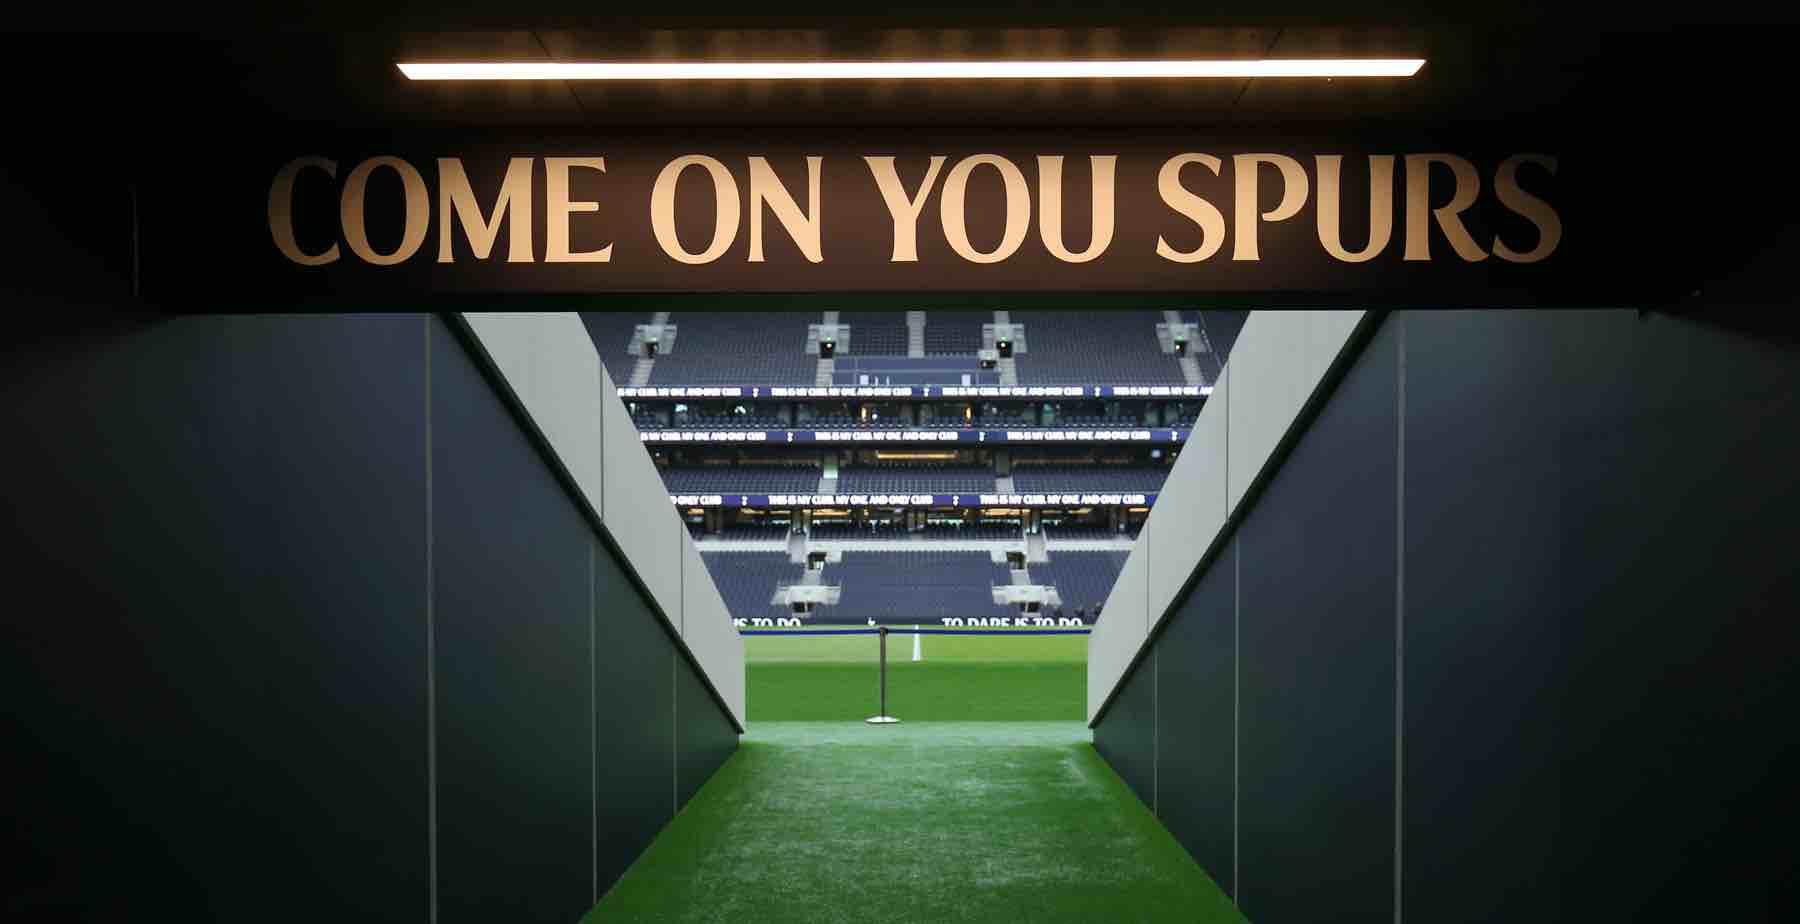 Tottenham Hotspur New Stadium Match And Tours King Goya